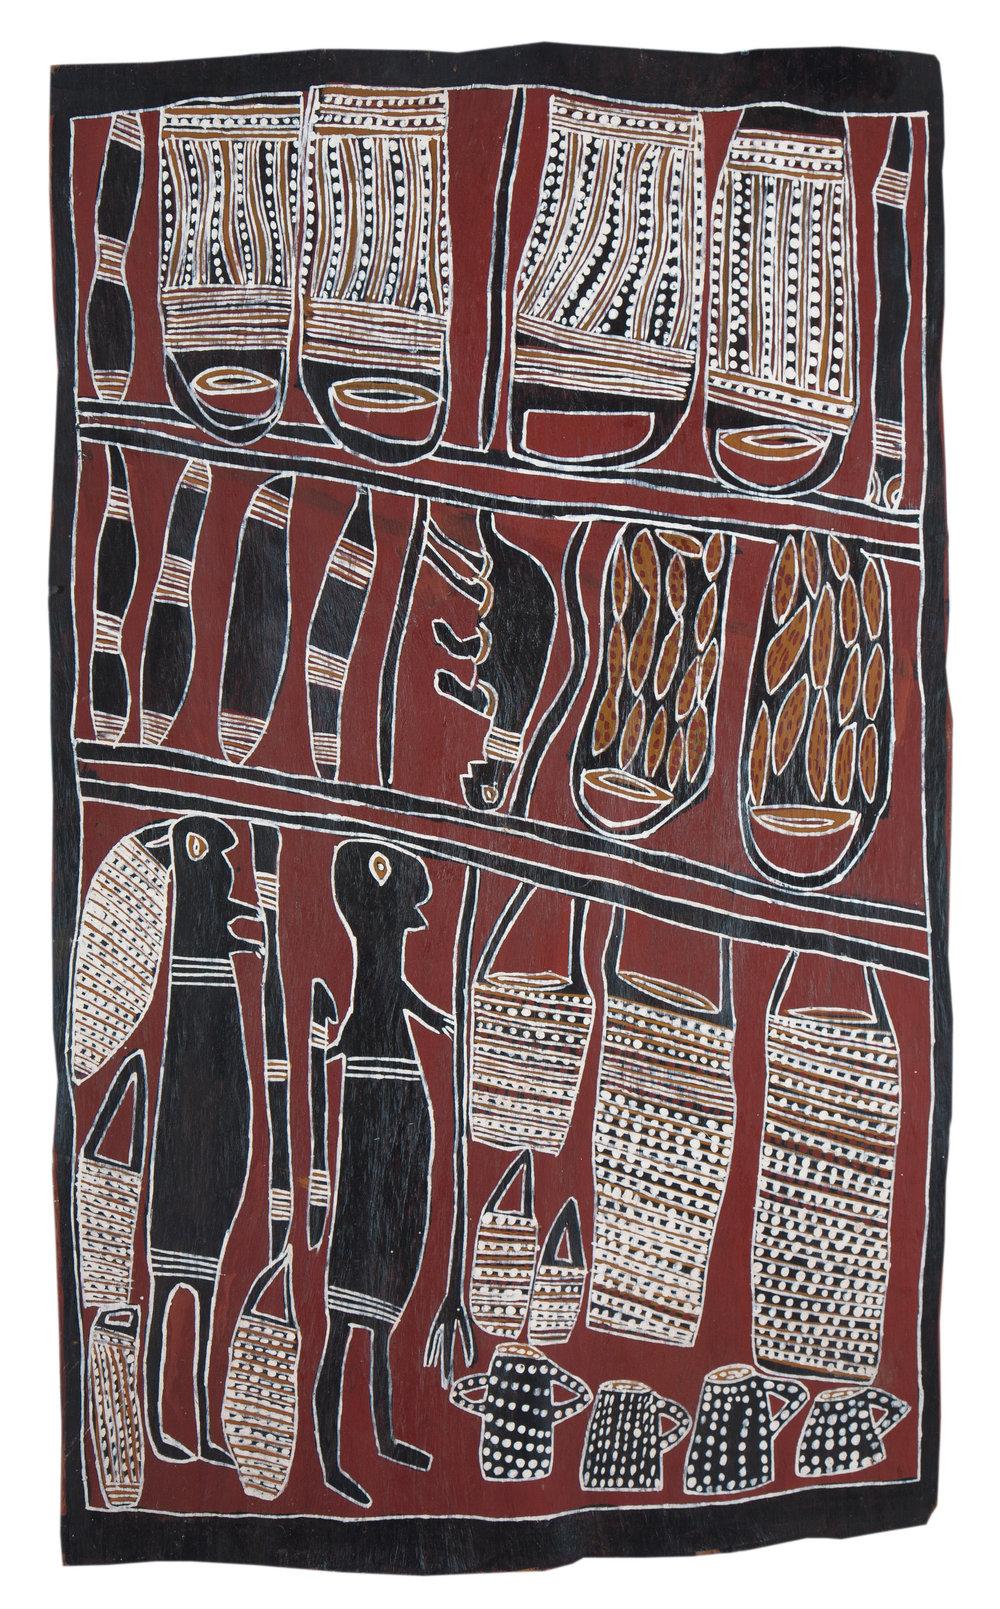 Nonggirrnga Marawili  Hunting  Natural earth pigments on bark 92 x 63cm  Buku Larrnggay Mulka #4044Q   EMAIL INQUIRY